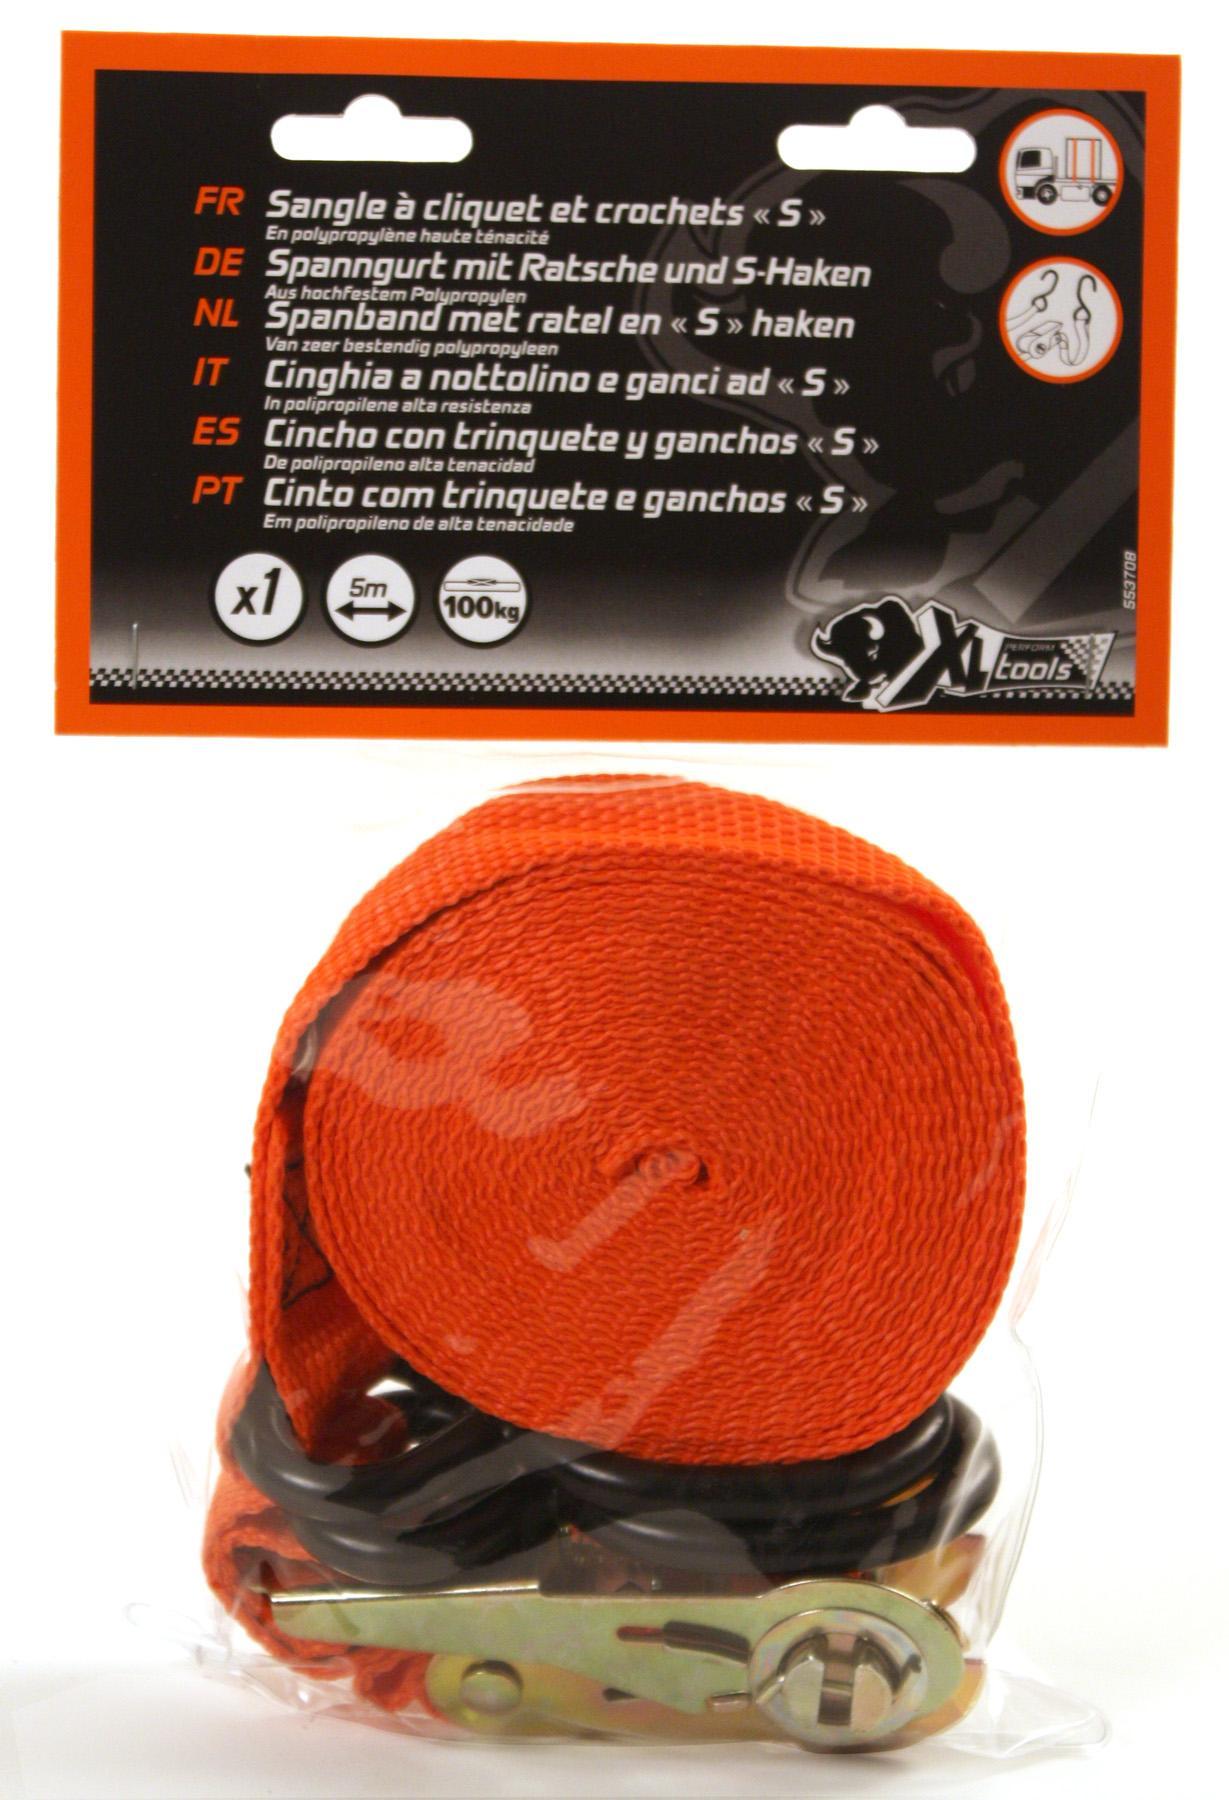 Lyftstroppar / stroppar XL 553704 Expertkunskap